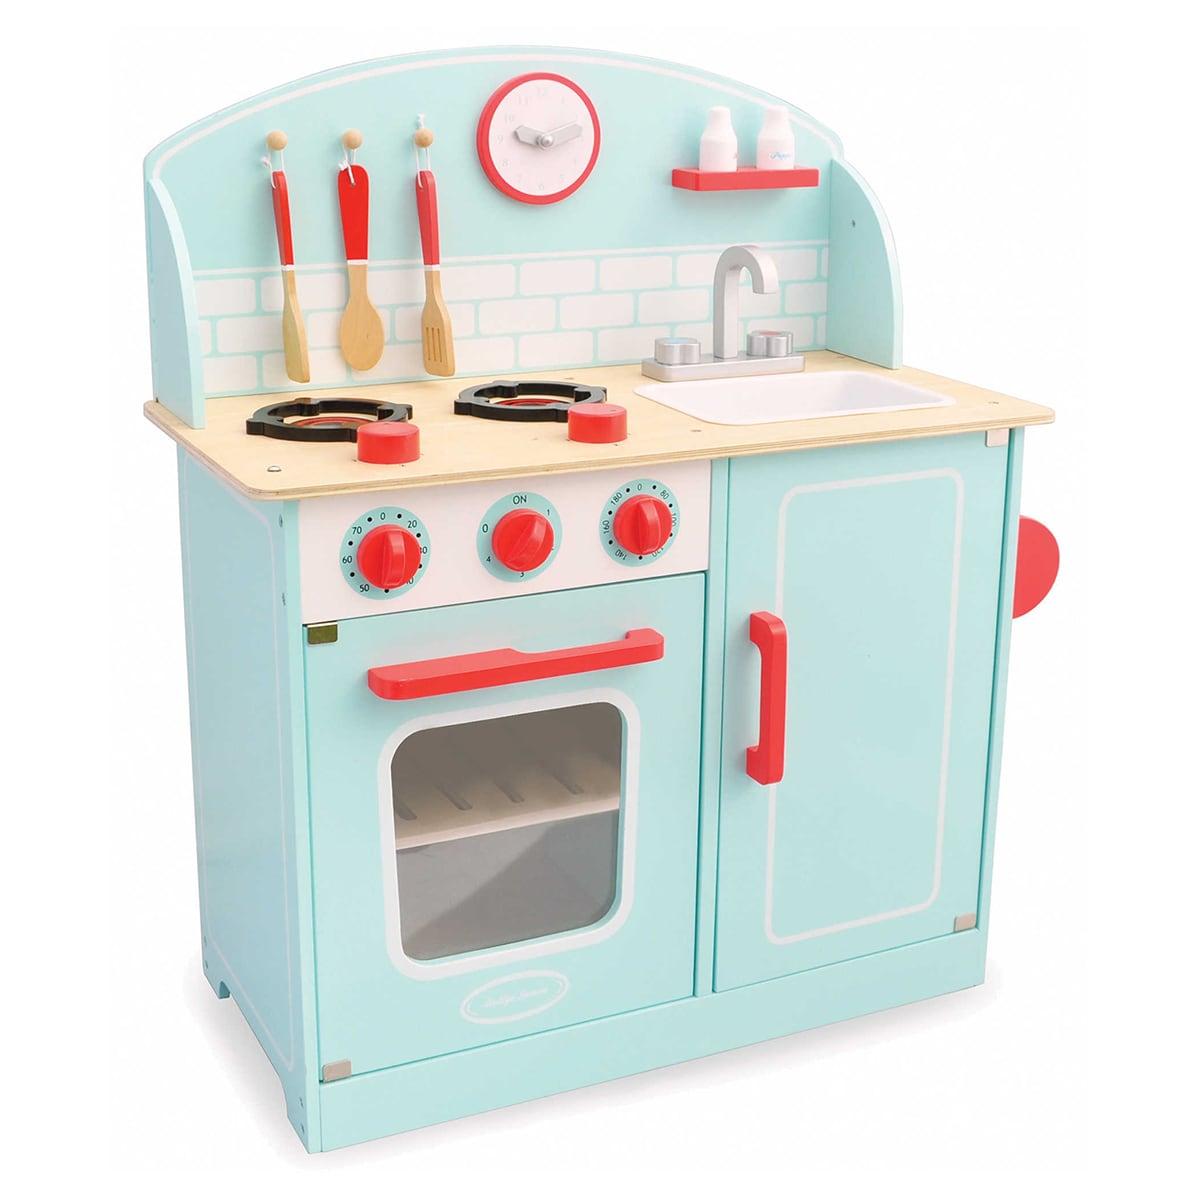 10 Super-Stylish Play Kitchens for Kids | Kitchn